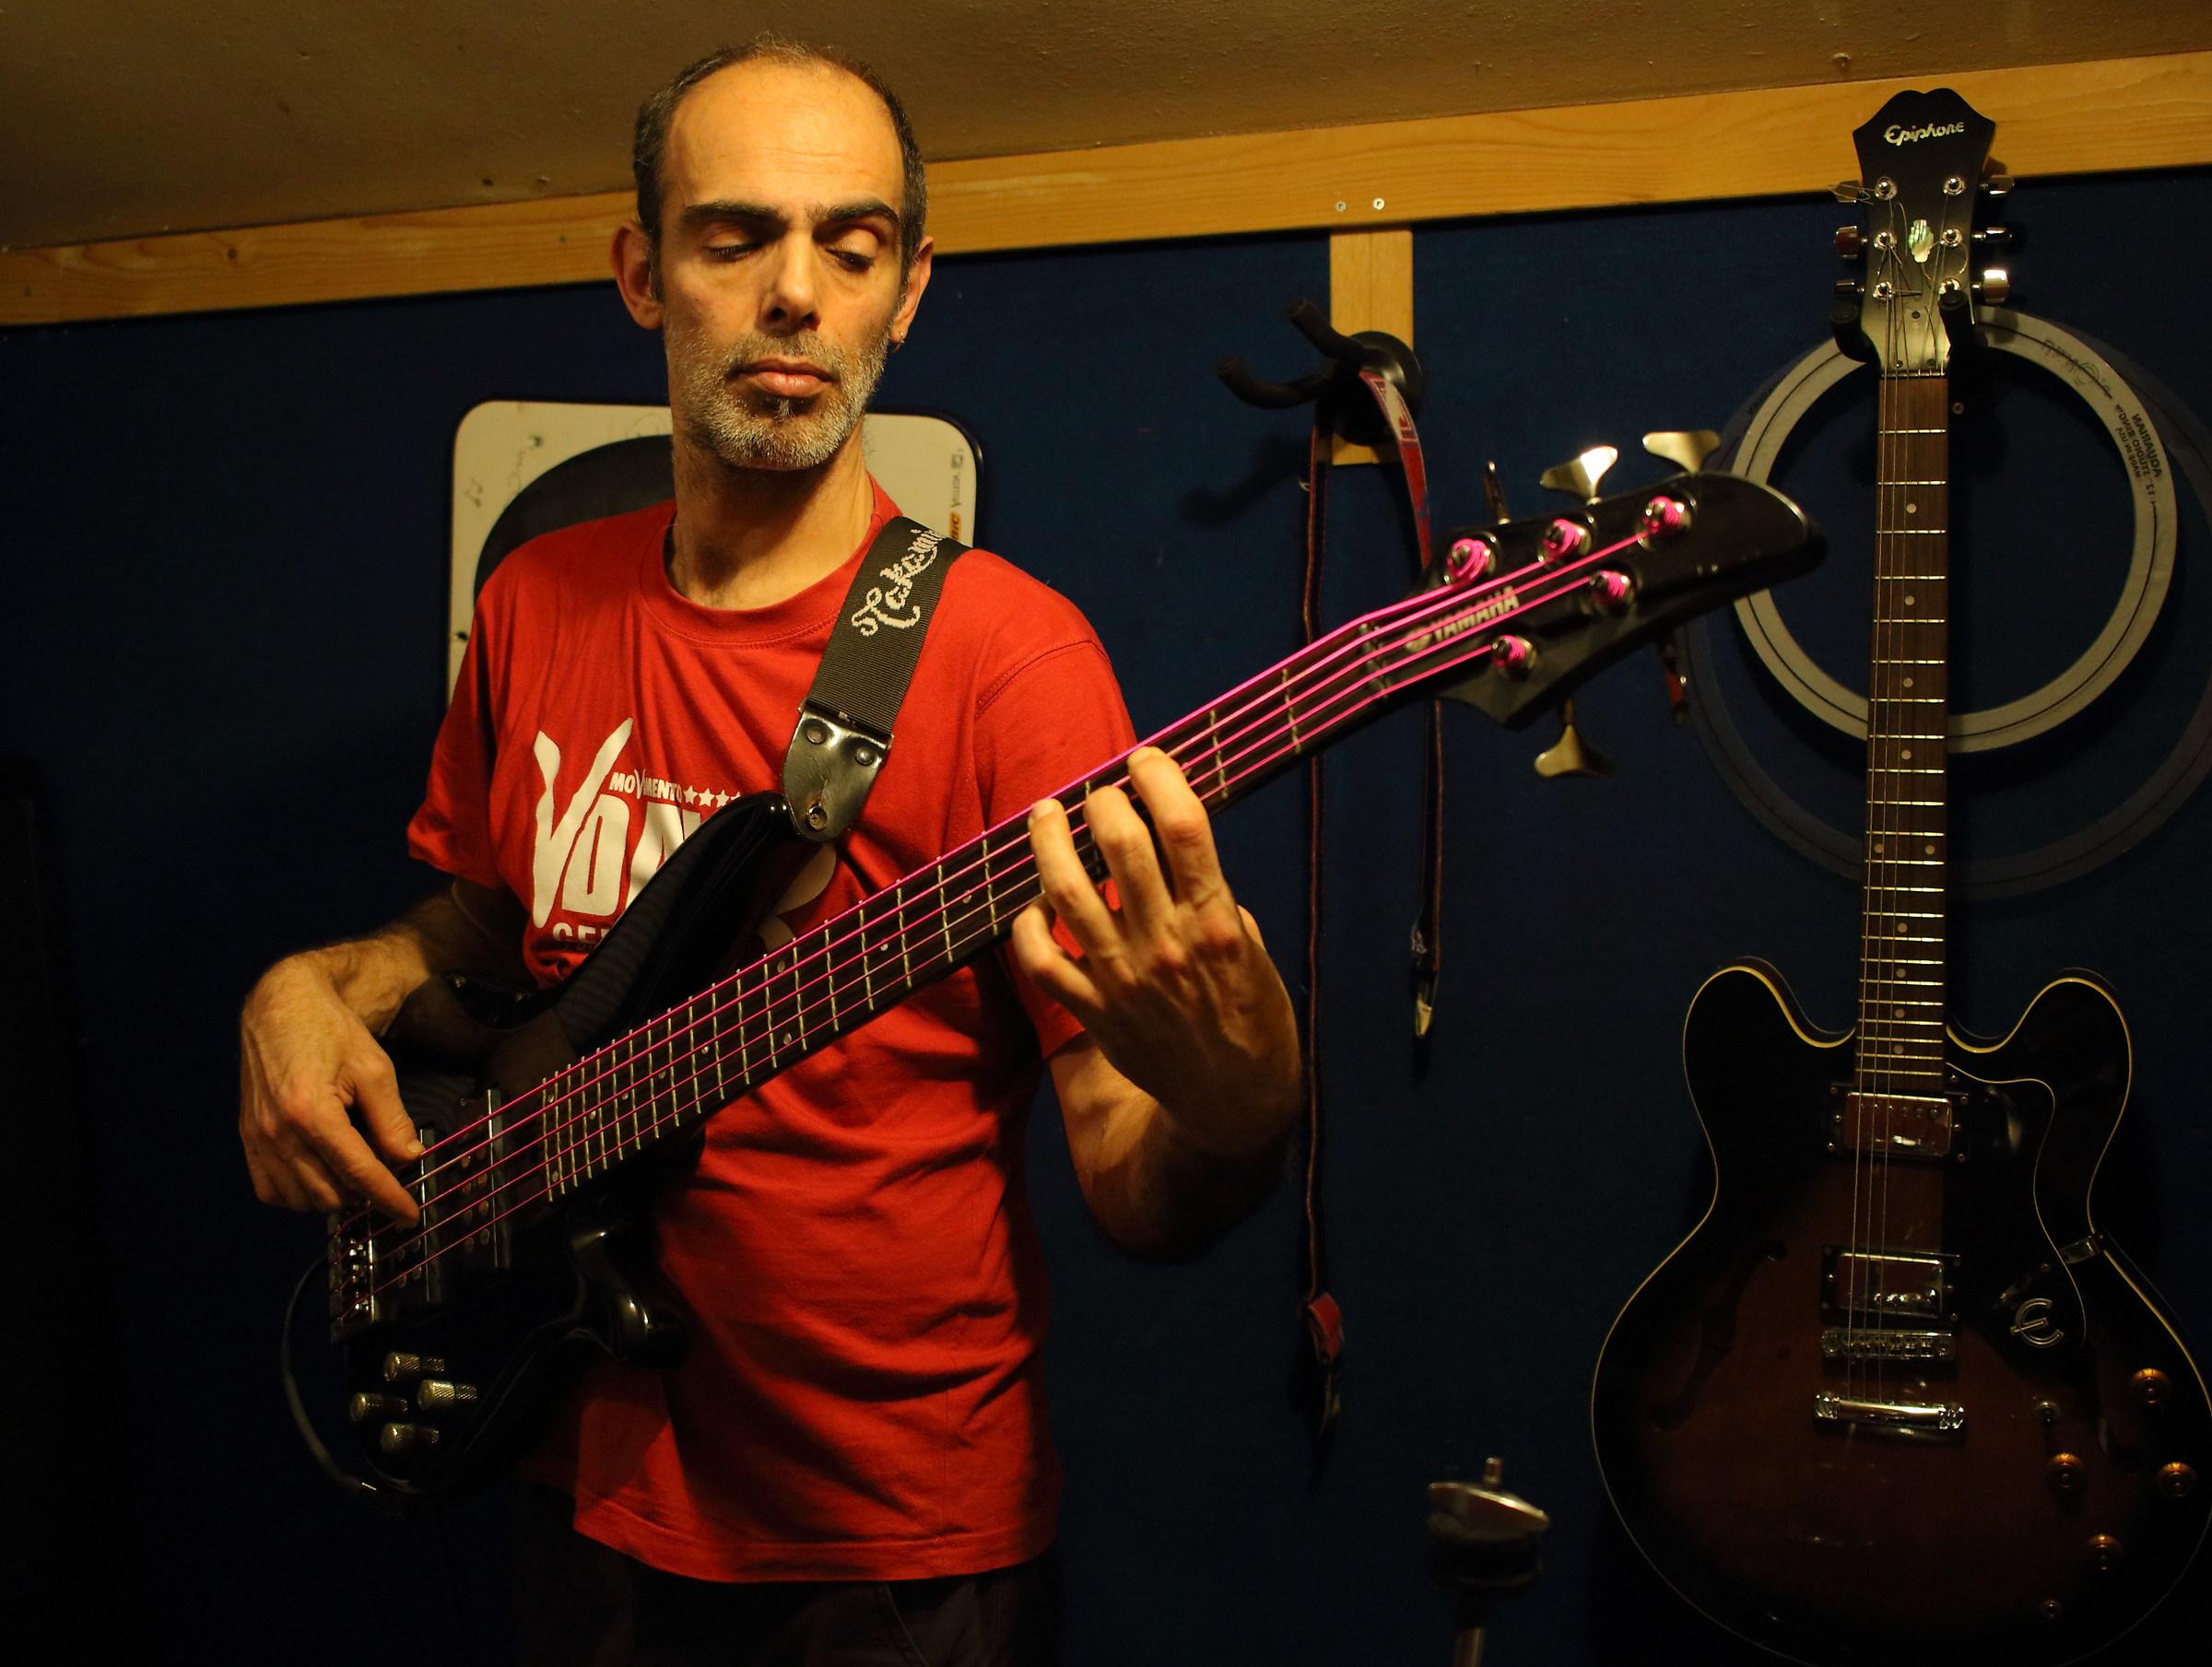 Bassman...